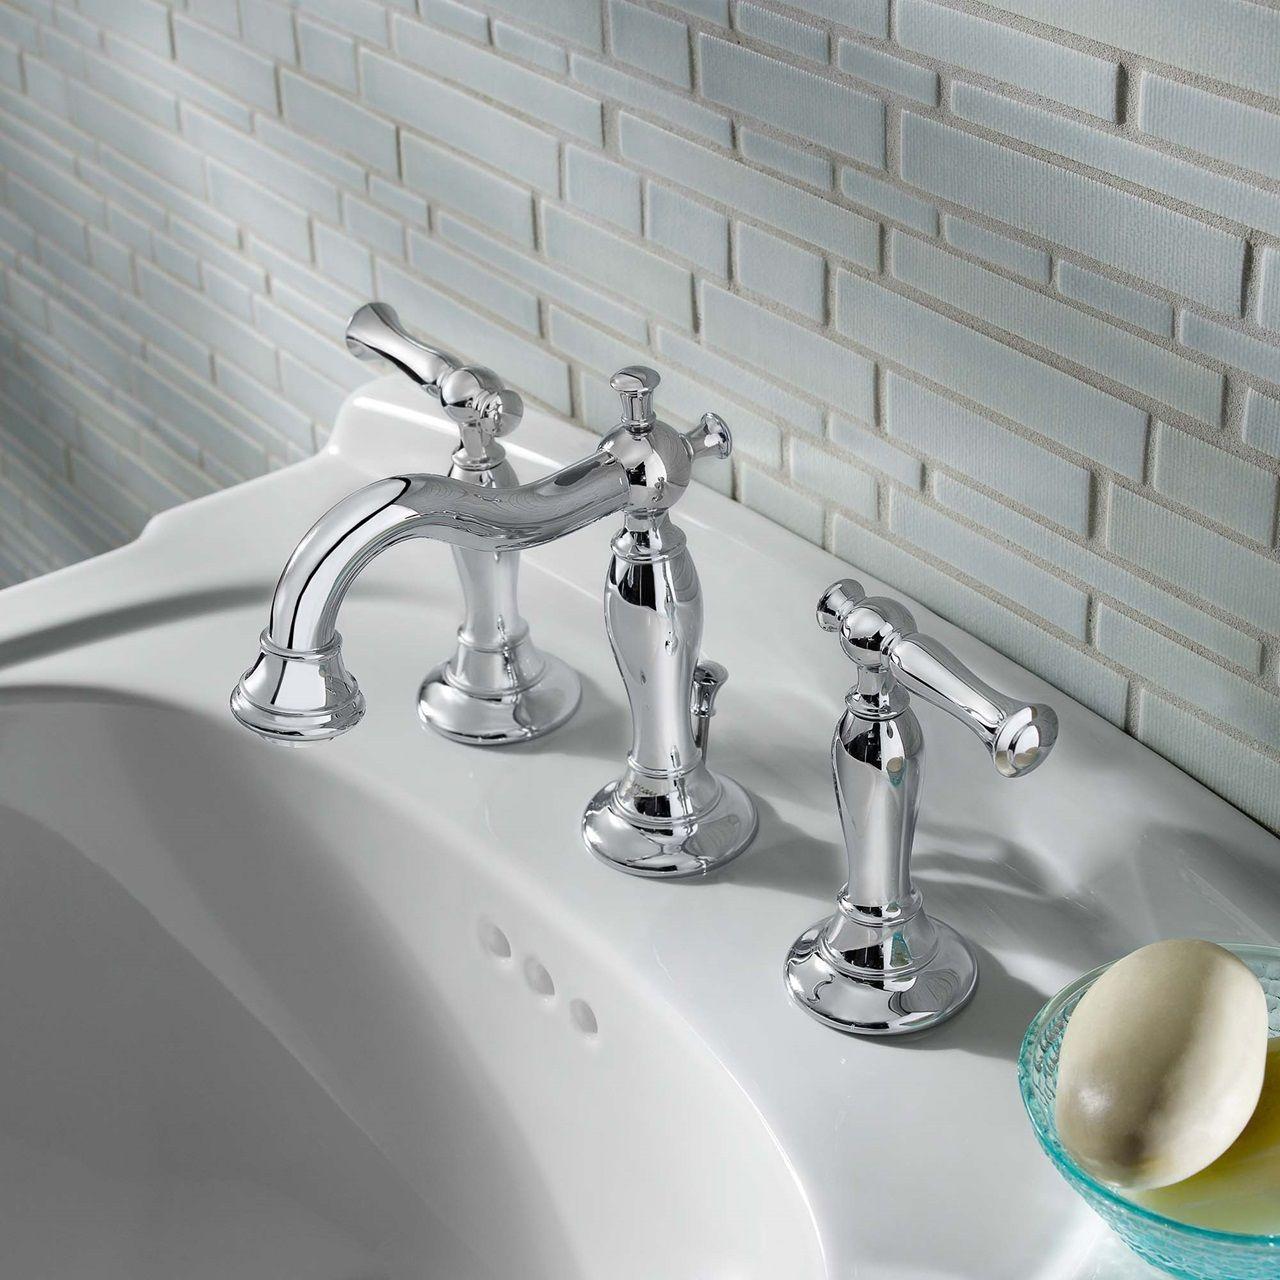 Bathroom Sink Faucets Quentin 2 Handle 8 Inch Widespread